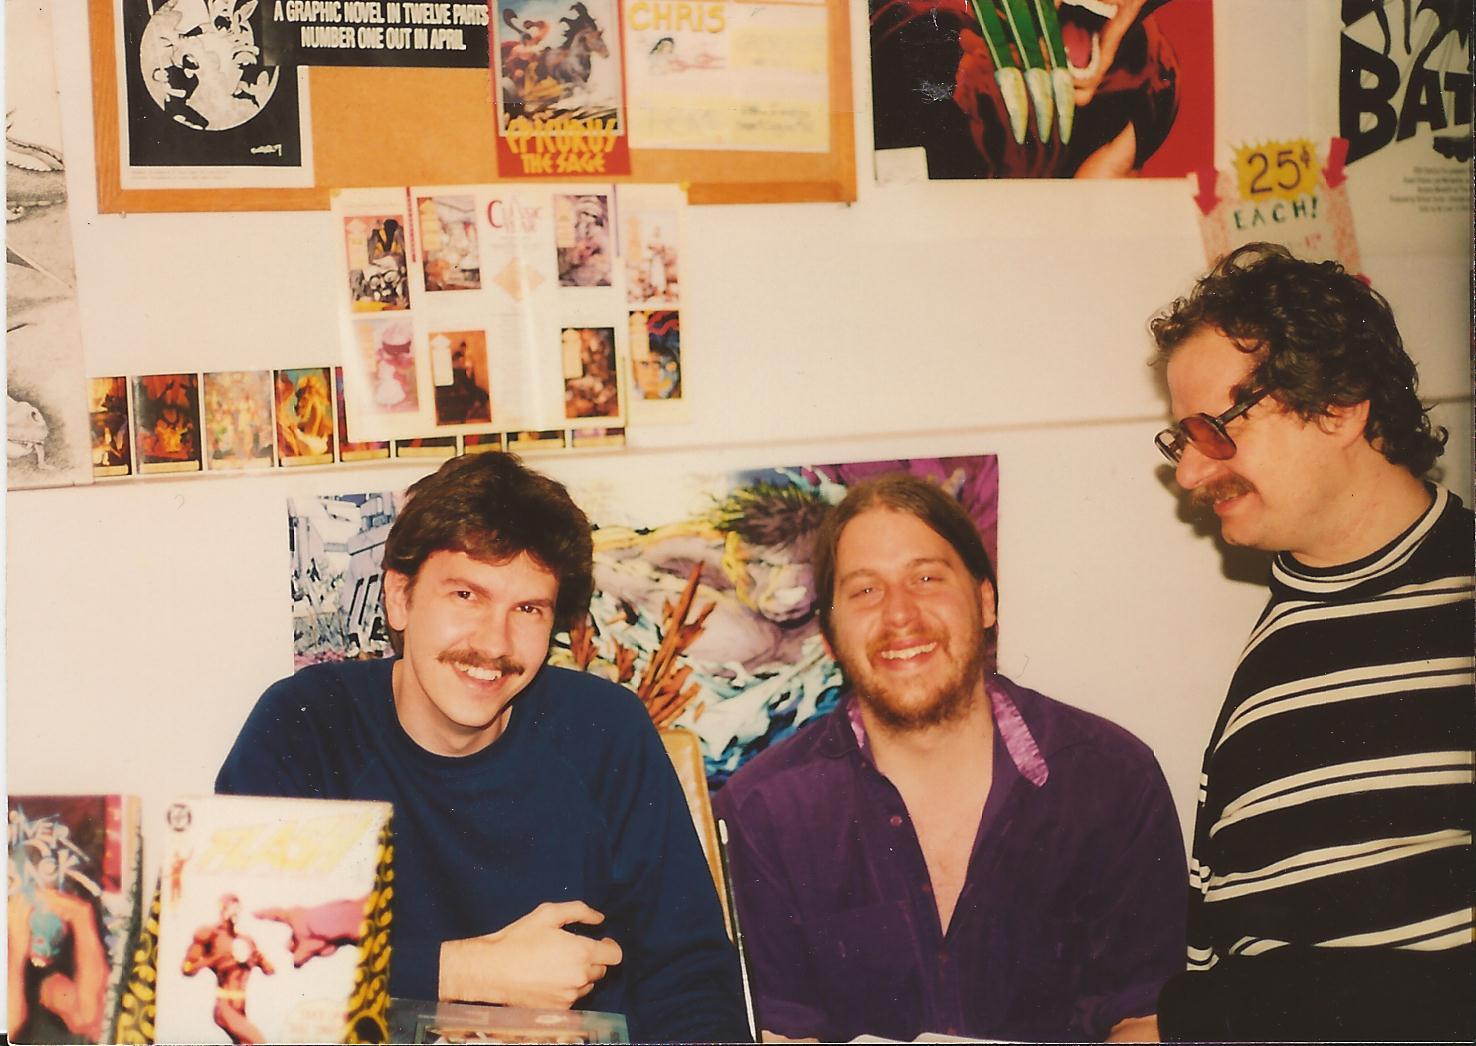 Sam Keith (l), Brian Hibbs (c), William Messner Loebs (r)